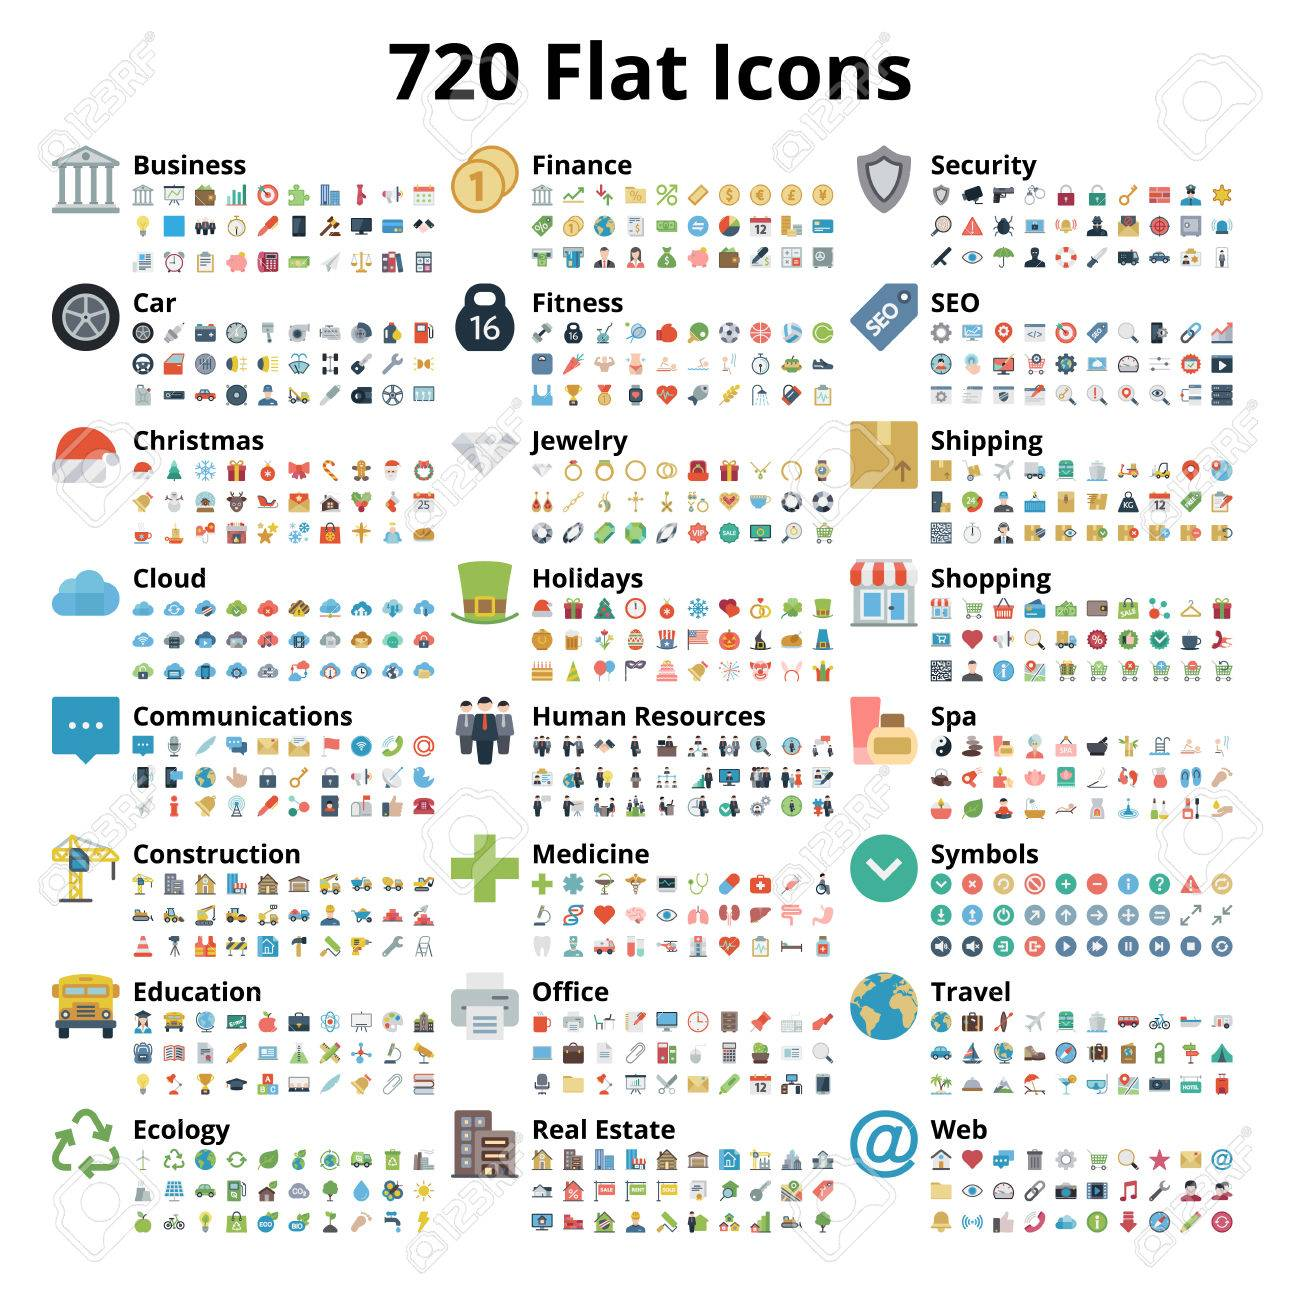 720 flat icons set. Vector illustration. - 75318301